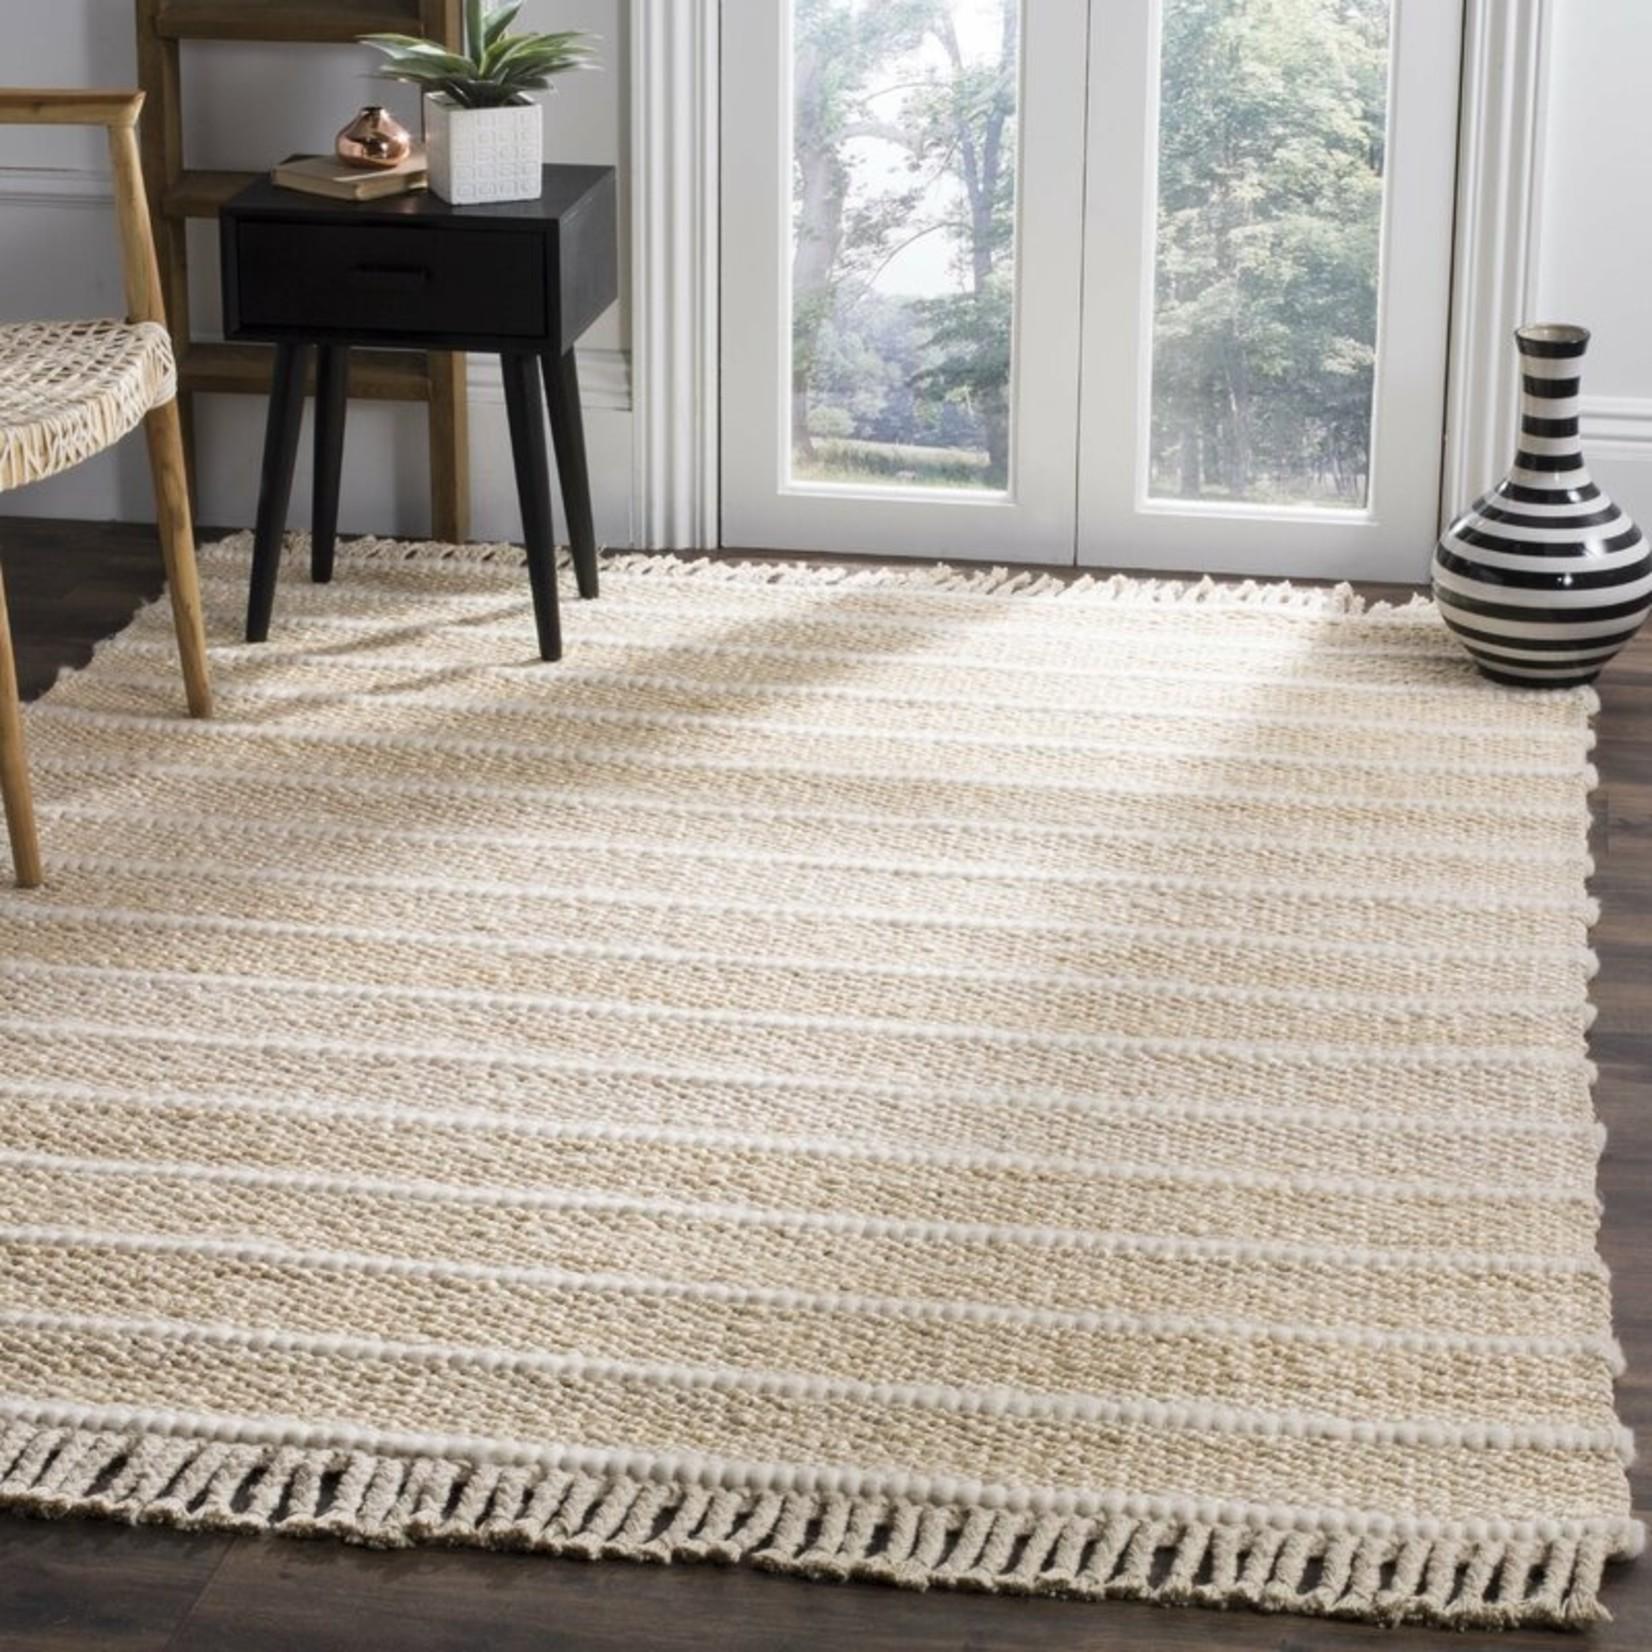 *6' Square - Lawtey Fiber Hand-Woven Beige Area Rug